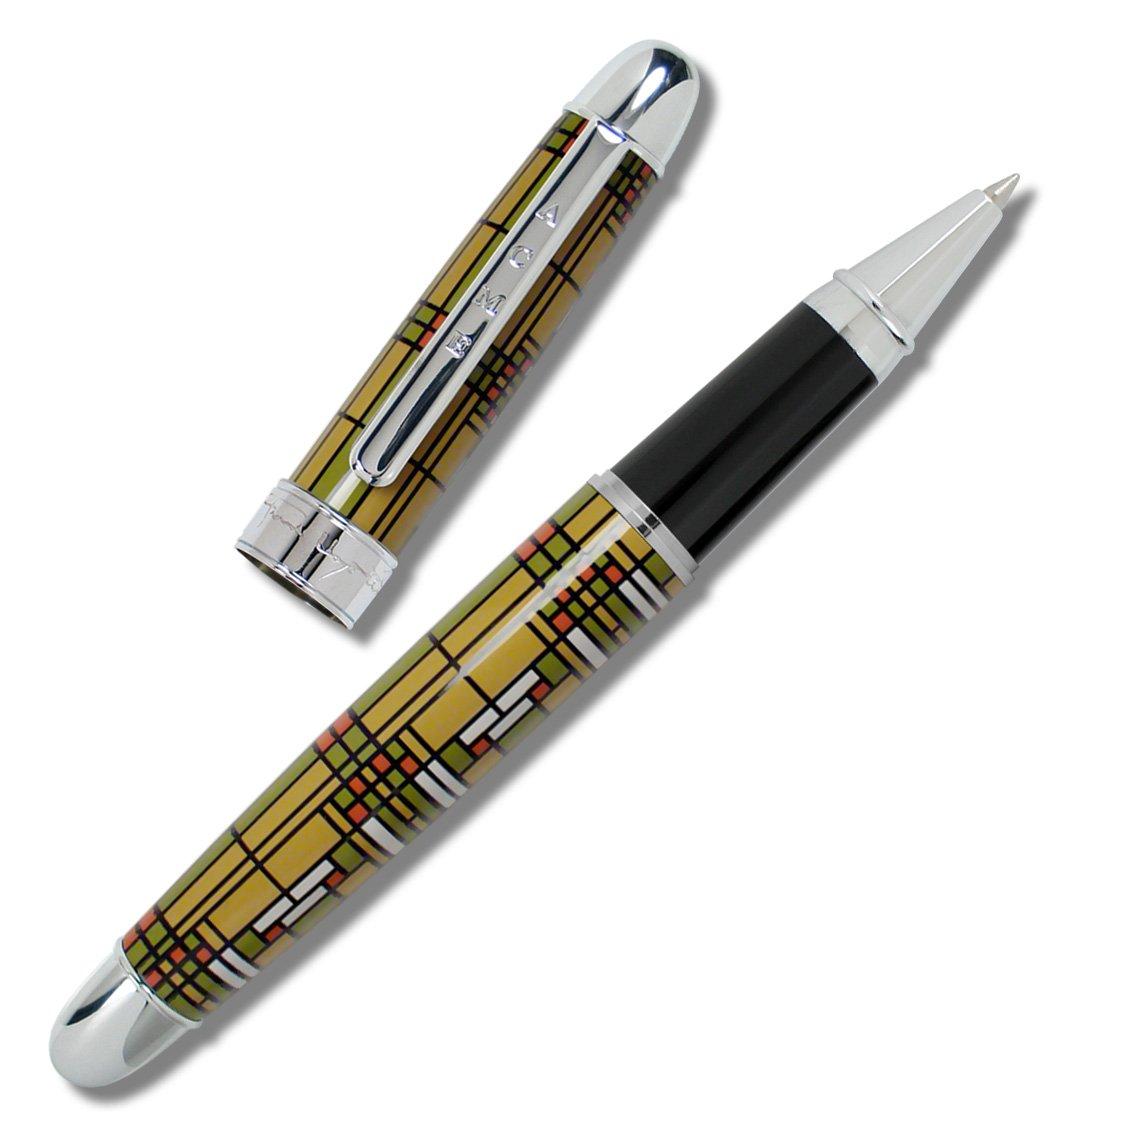 ACME Studios Home & Studio Roller Ball Pen by Frank Lloyd Wright (PW11R) by ACME Studios Inc